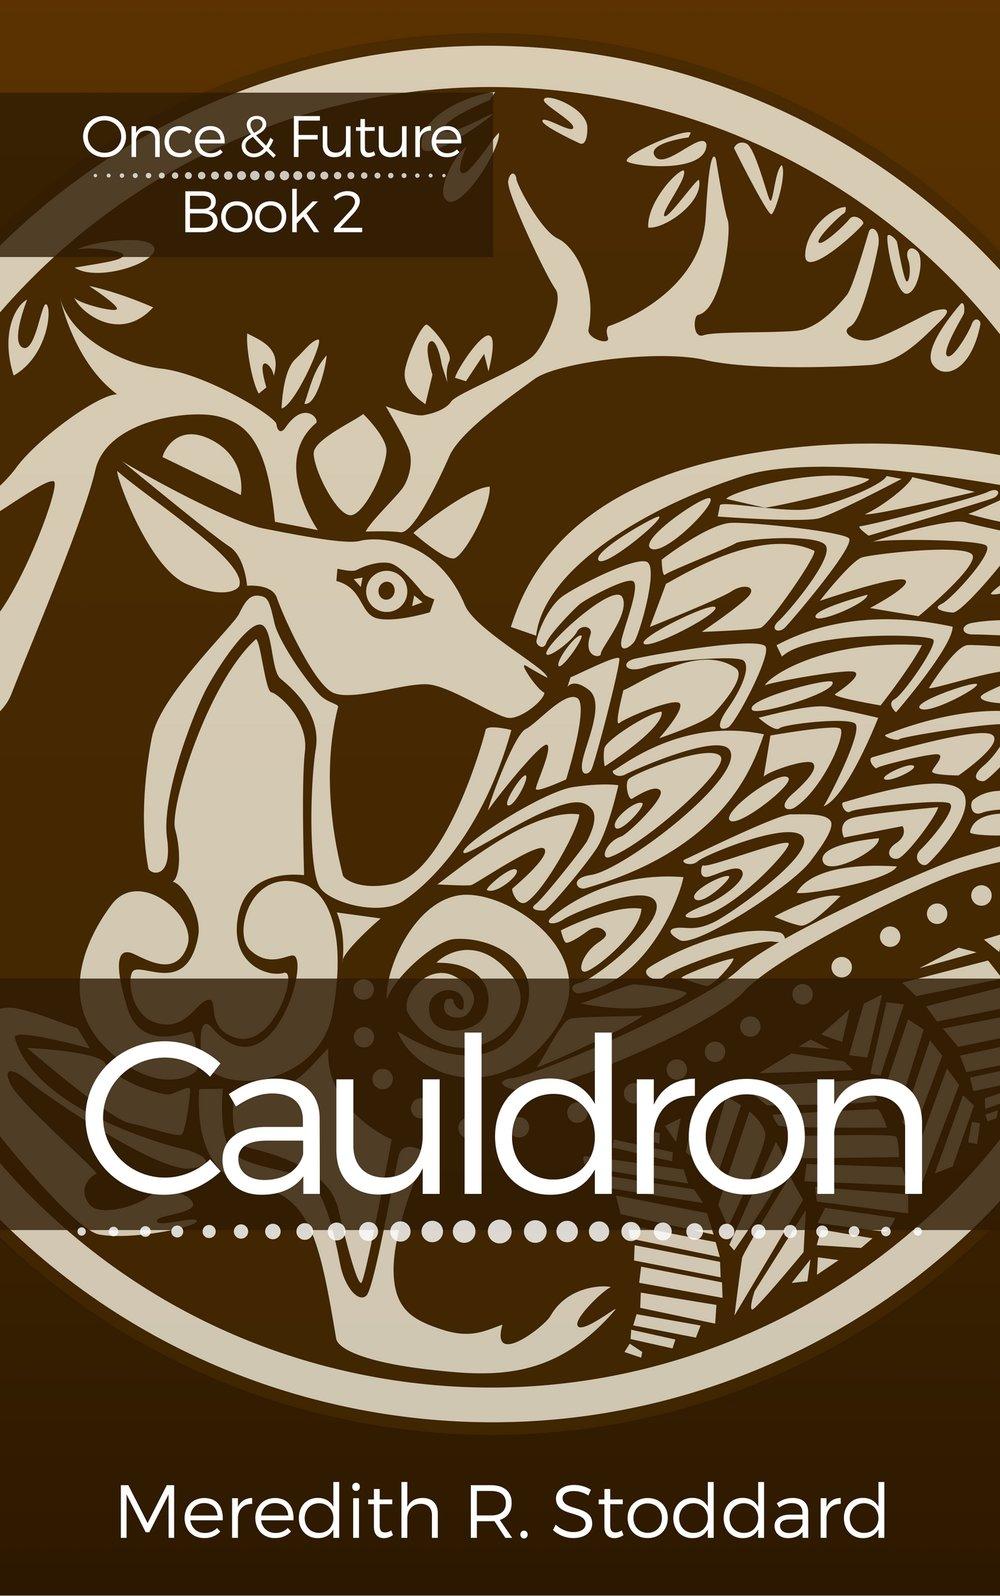 Cauldron (3).jpg